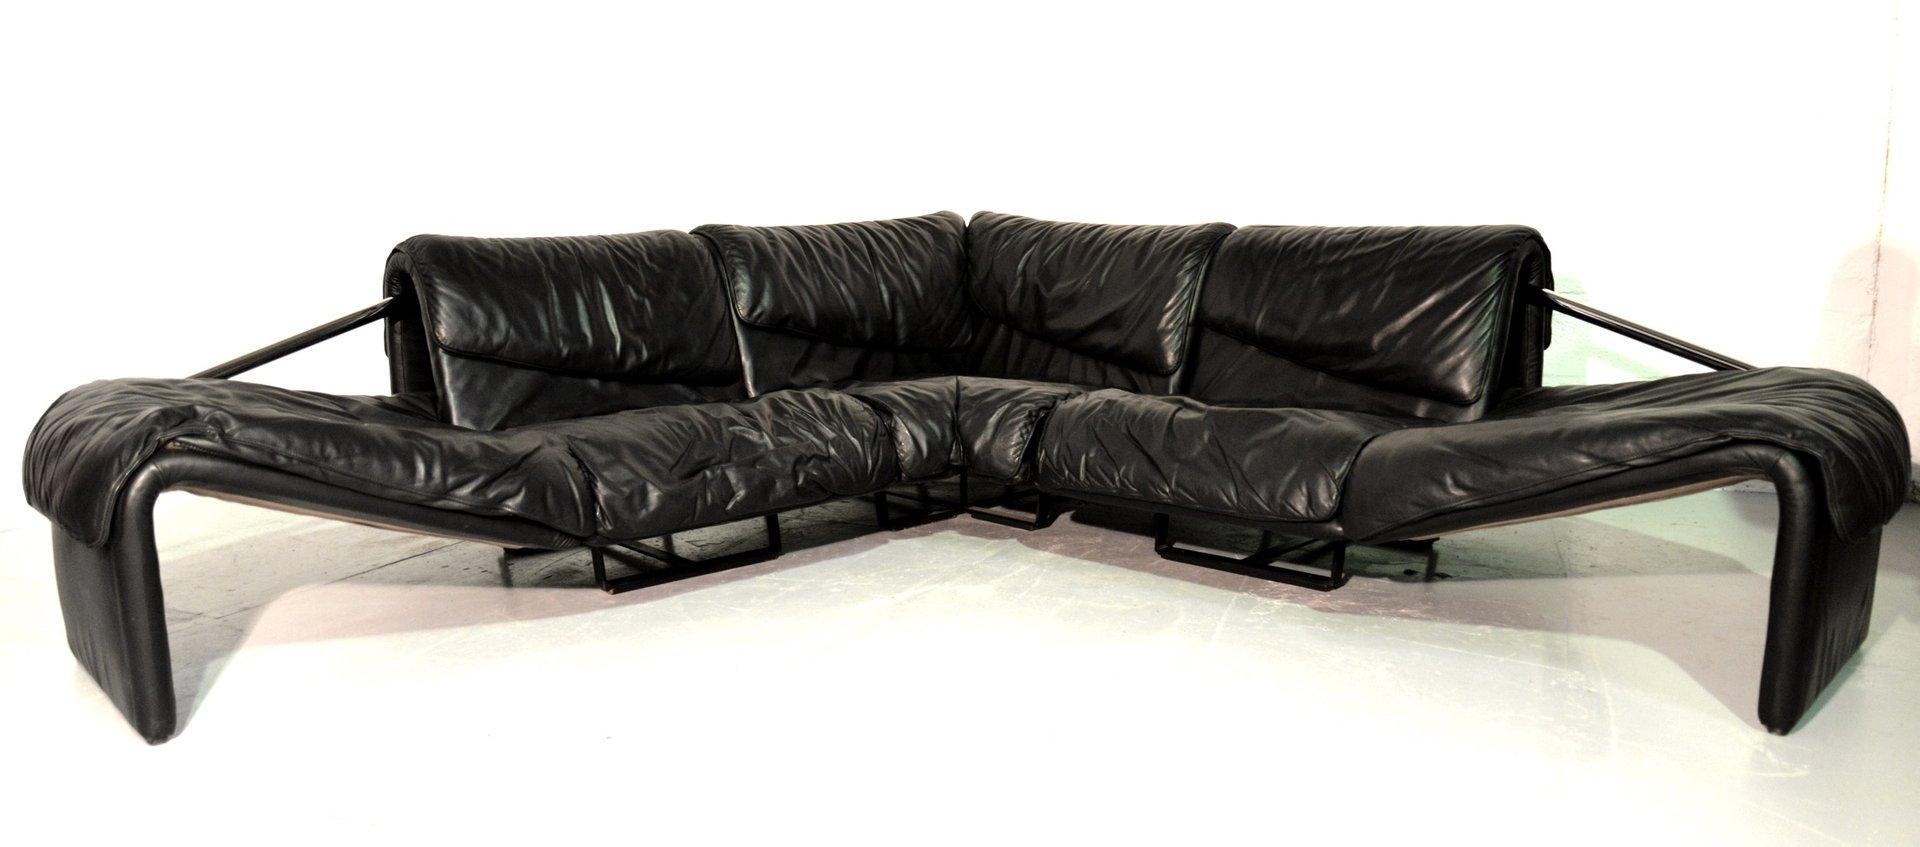 leather corner sofa spain karlstad cover isunda gray inmotion from de sede 1970s for sale